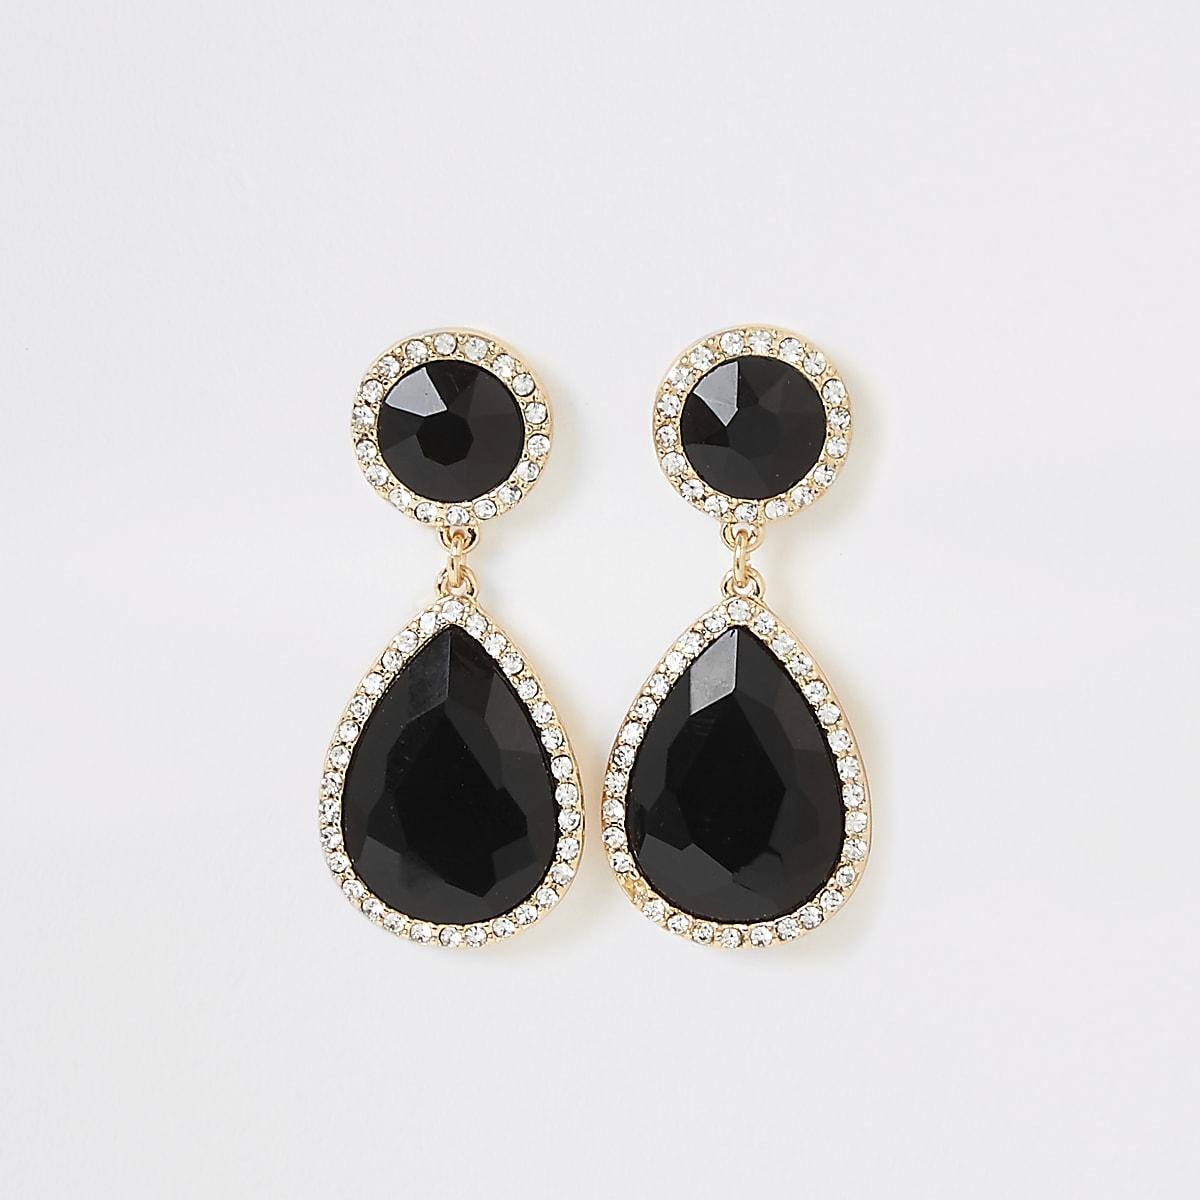 Black stone diamante drop earrings